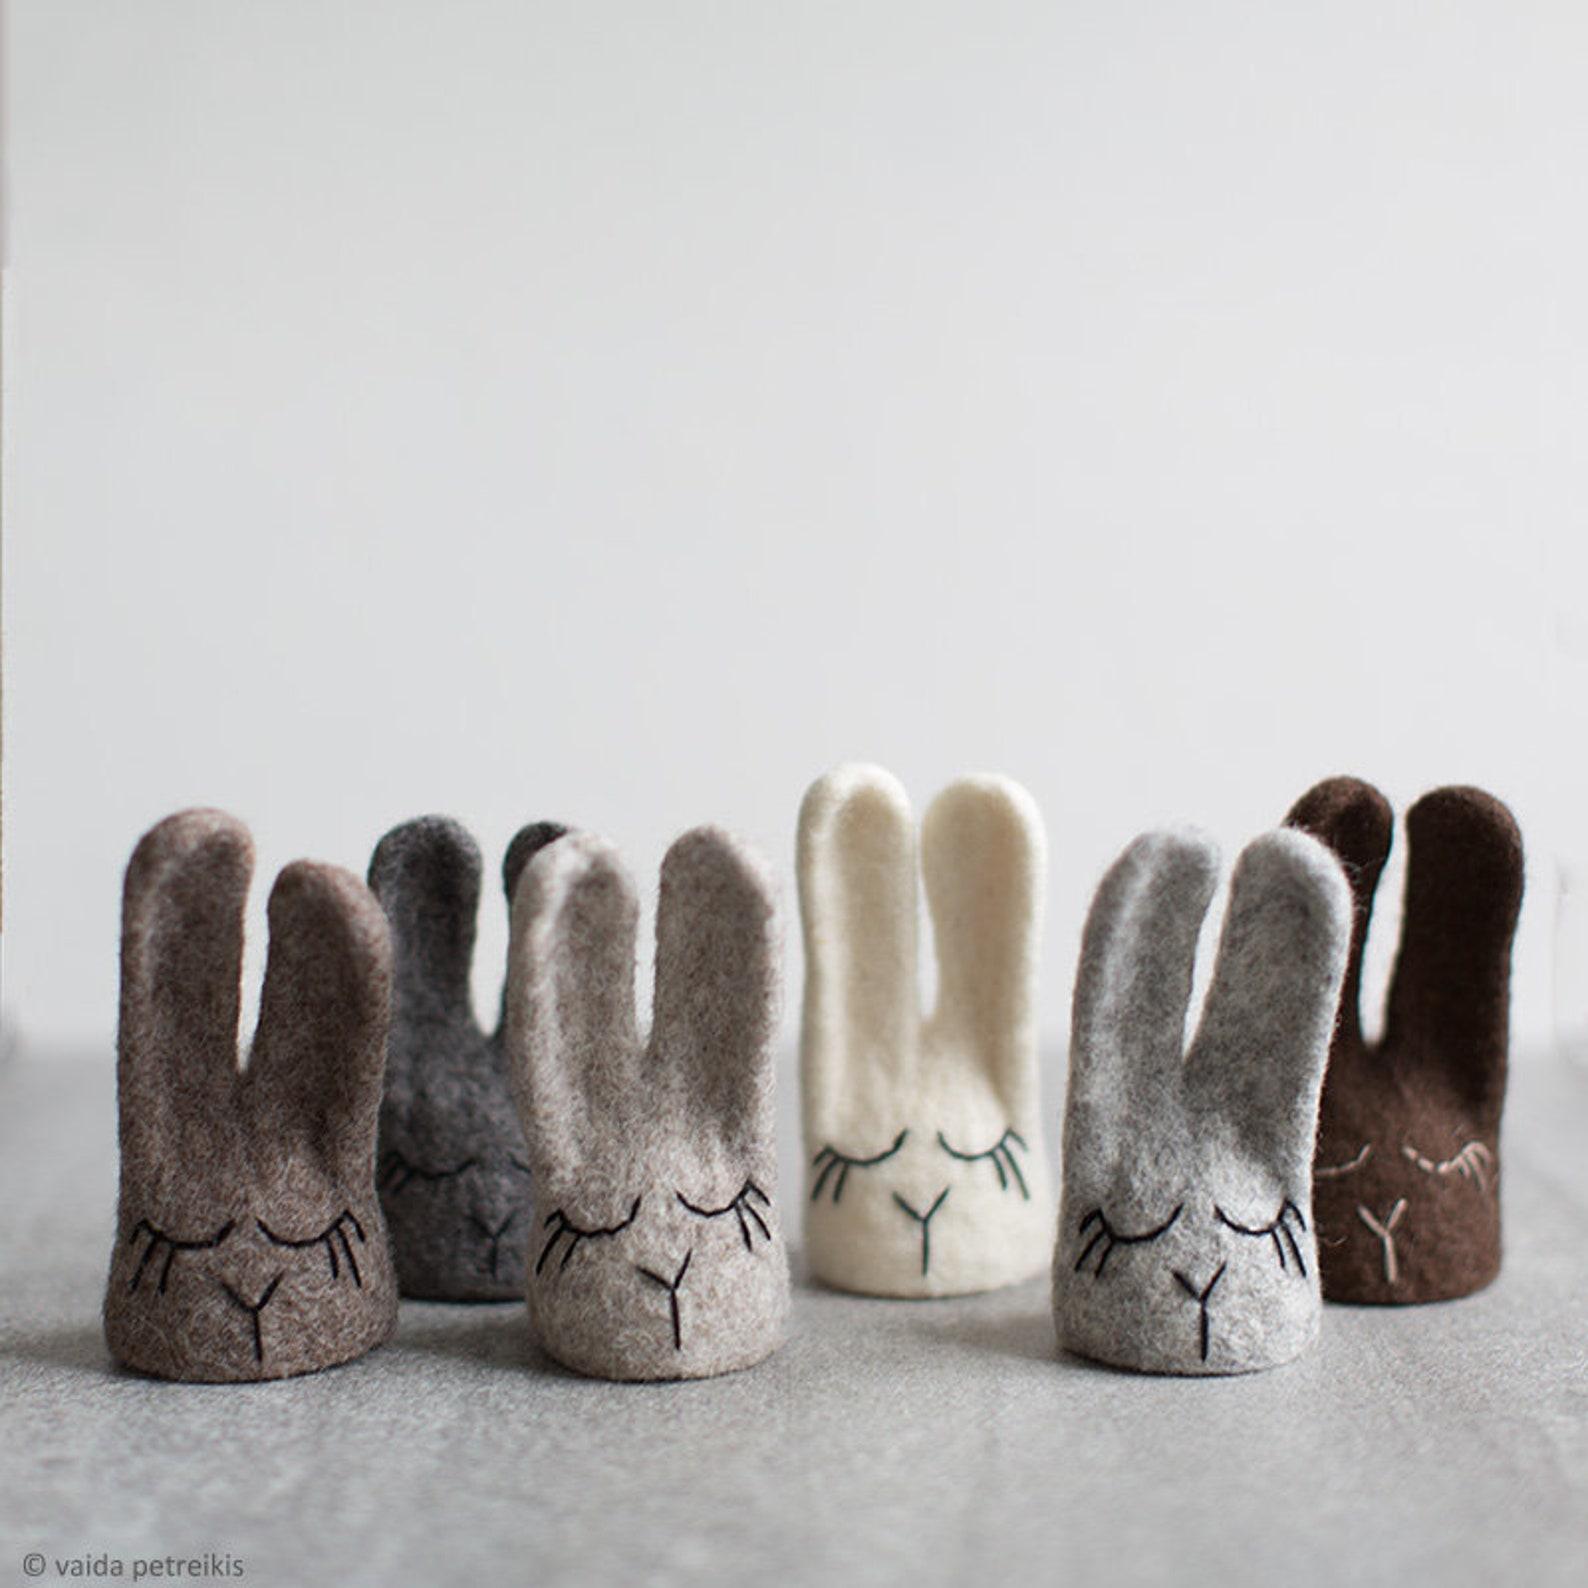 Woolen Easter Bunny Egg Cozies in Neutral Colors